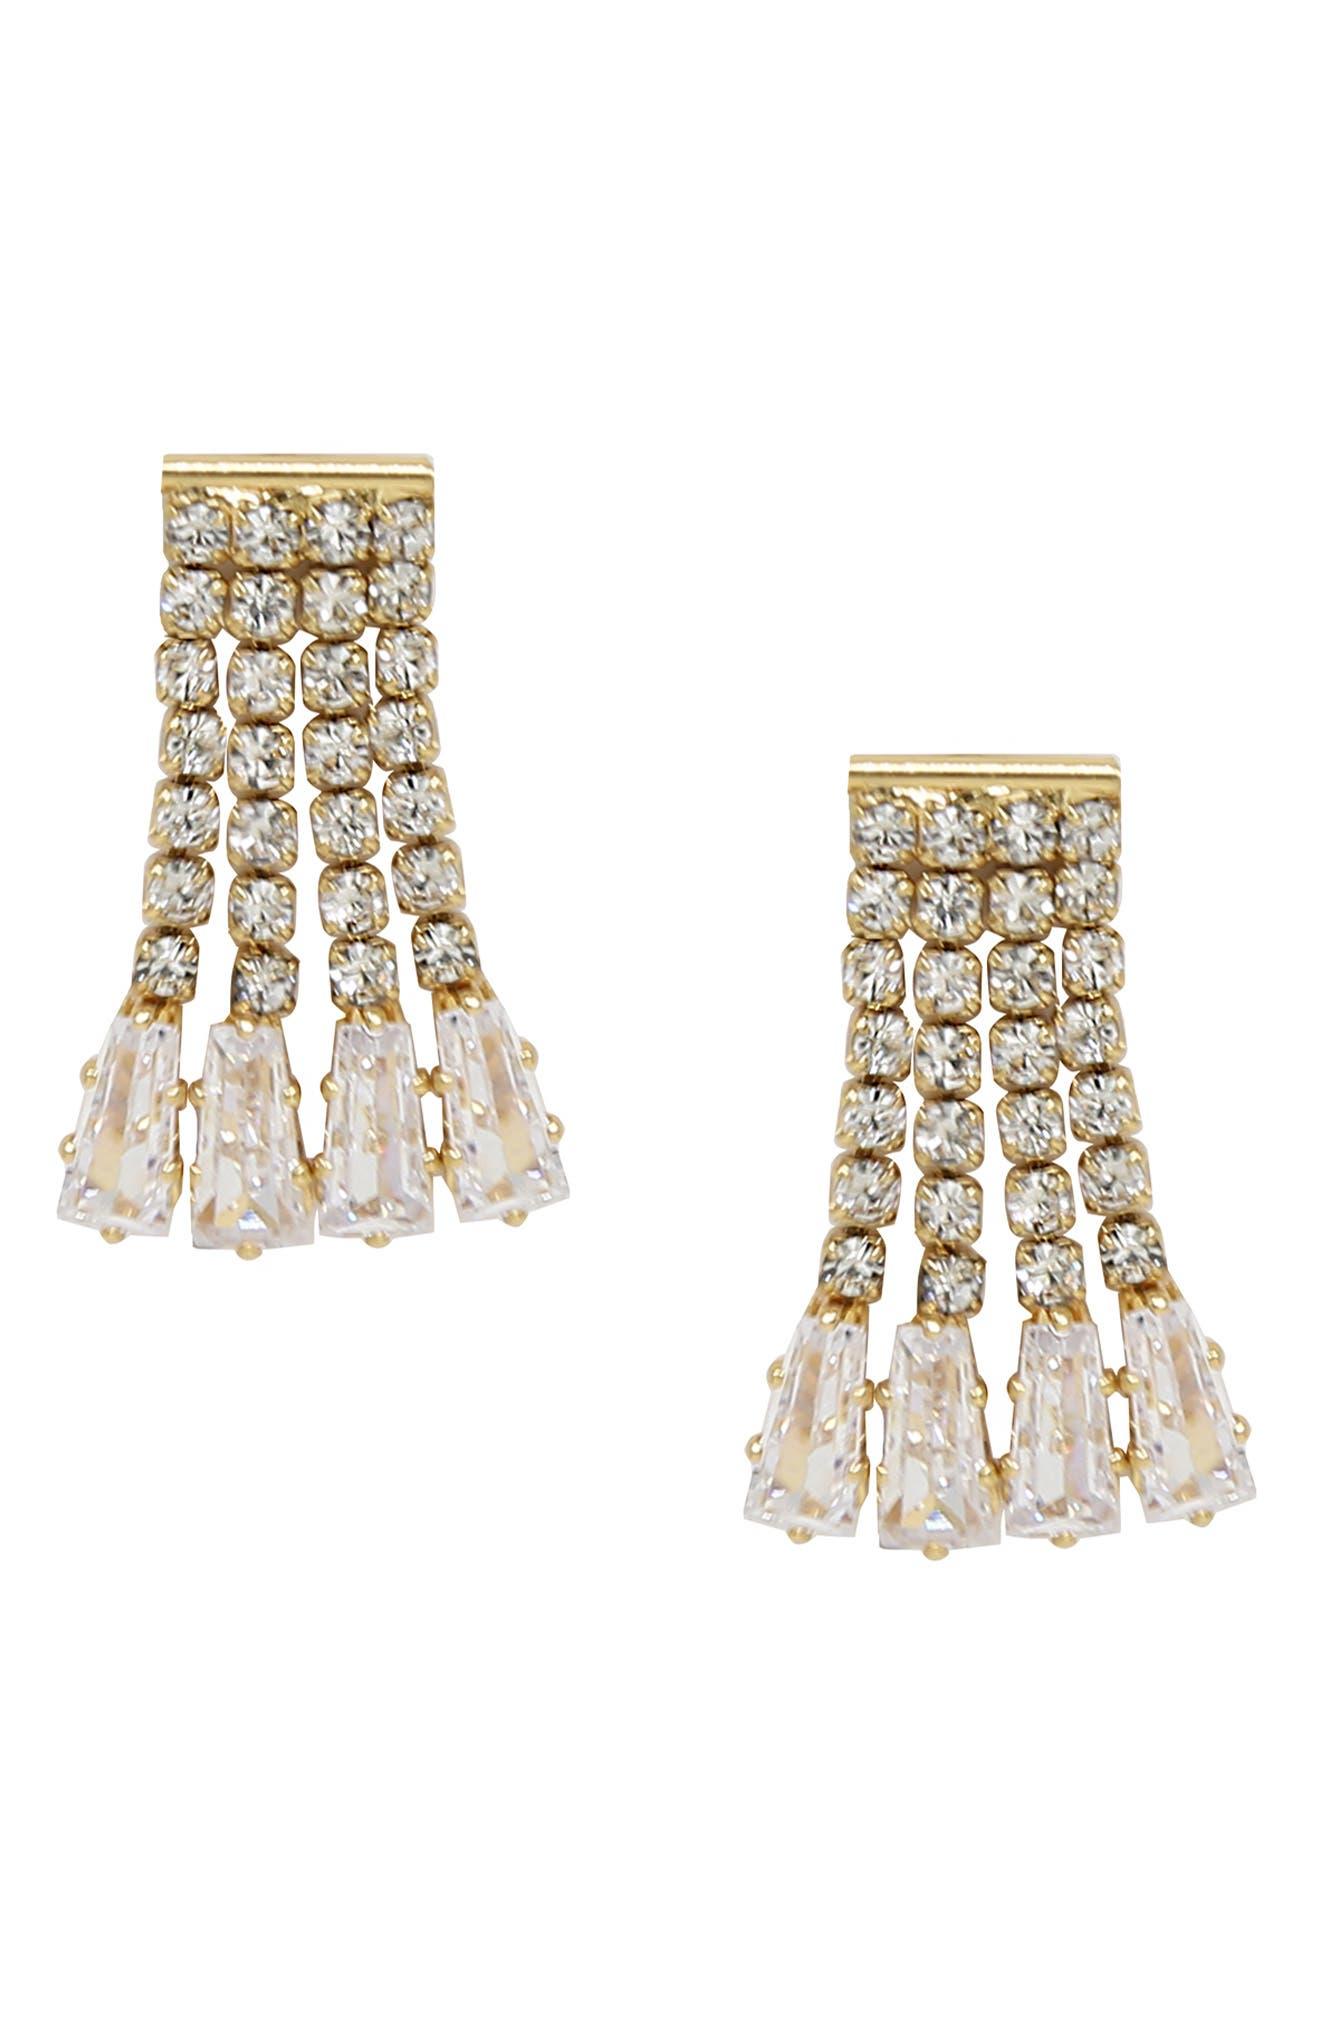 Crystal Fringe Stud Earrings